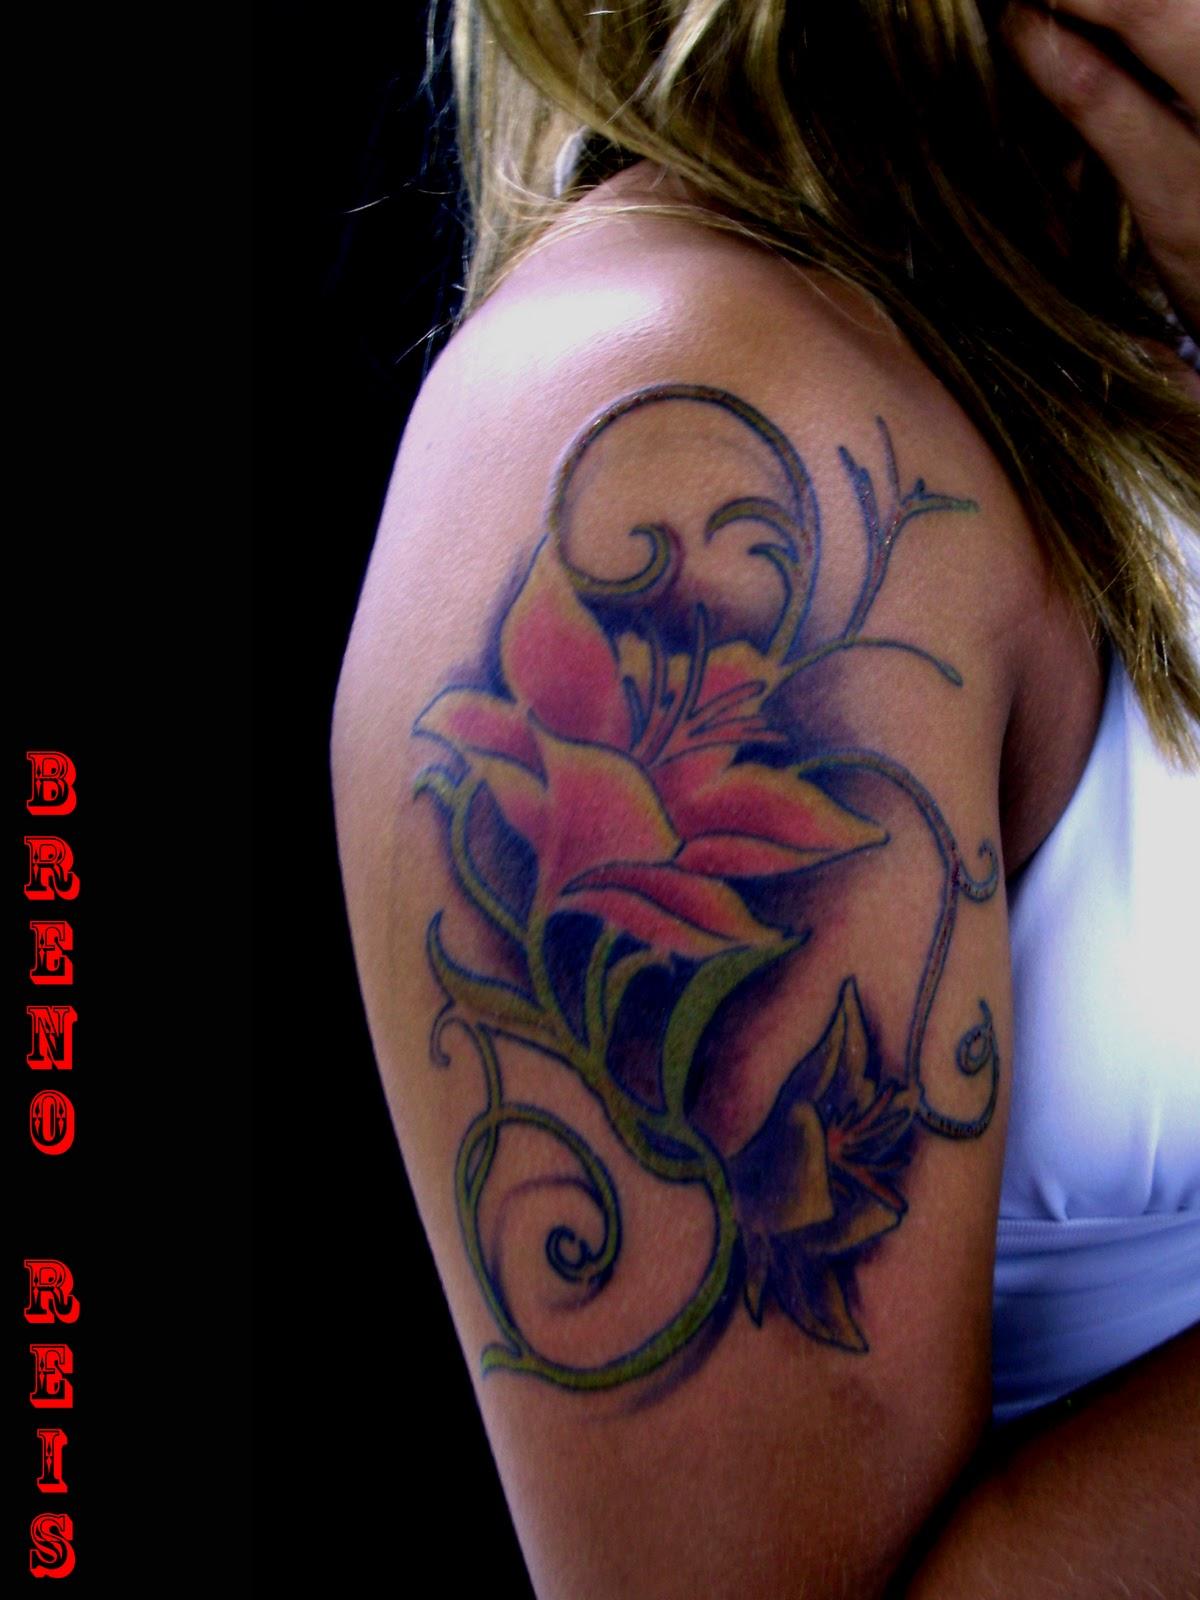 http://4.bp.blogspot.com/_lT9snefCZFw/TMoB2FpFSxI/AAAAAAAAAaQ/phoLtHcy-MM/s1600/floral.jpg